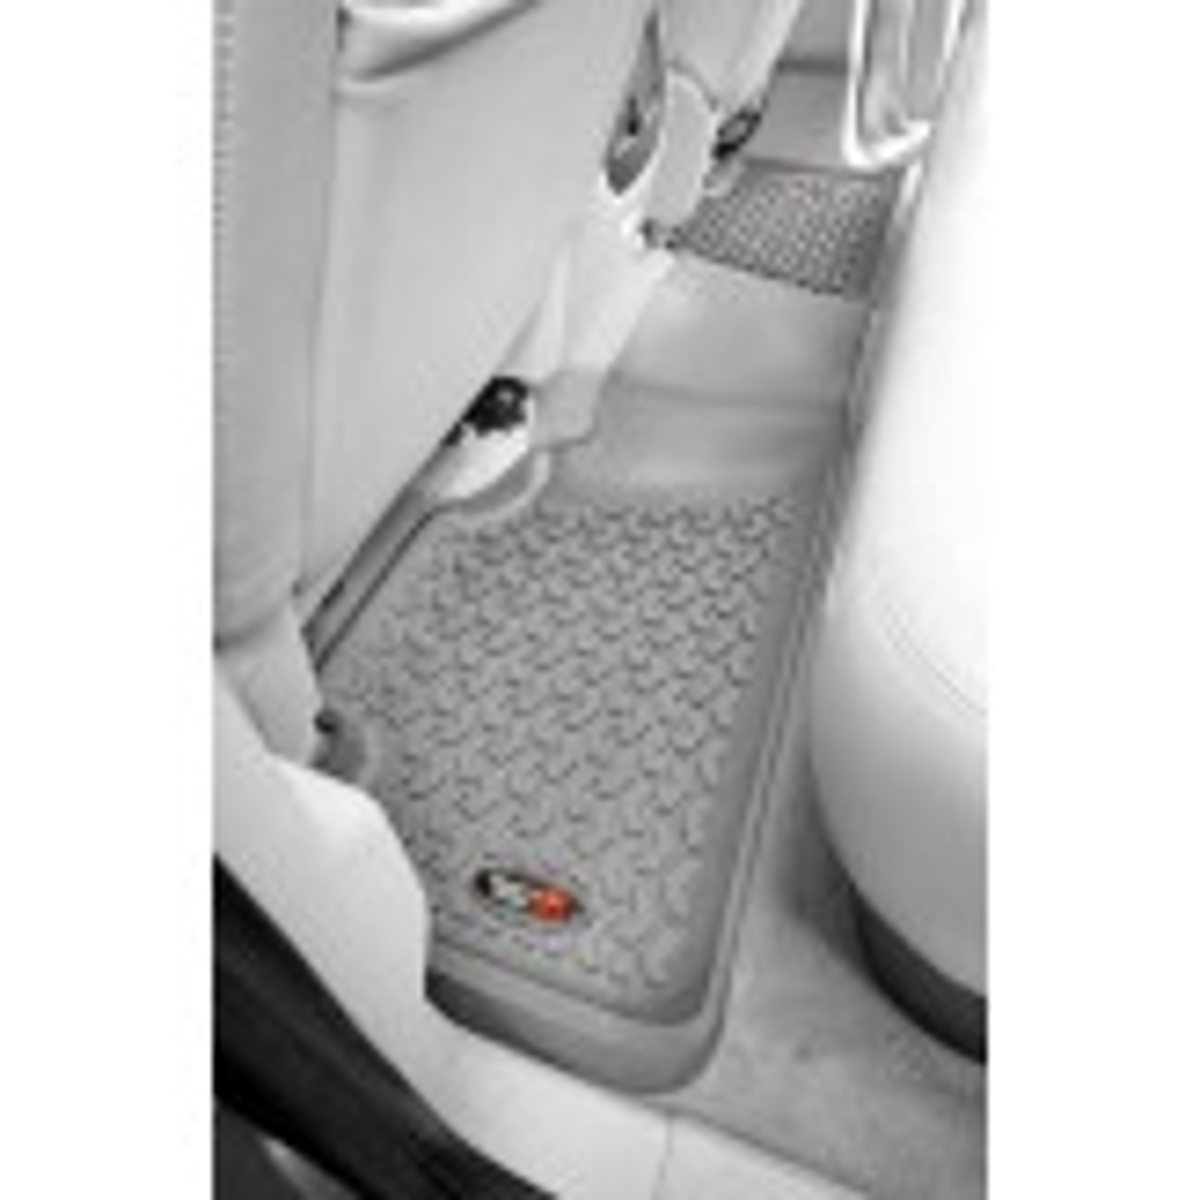 Floor Liners, Rear, Gray; 07-13 Silverado/Sierra 1500 Extended